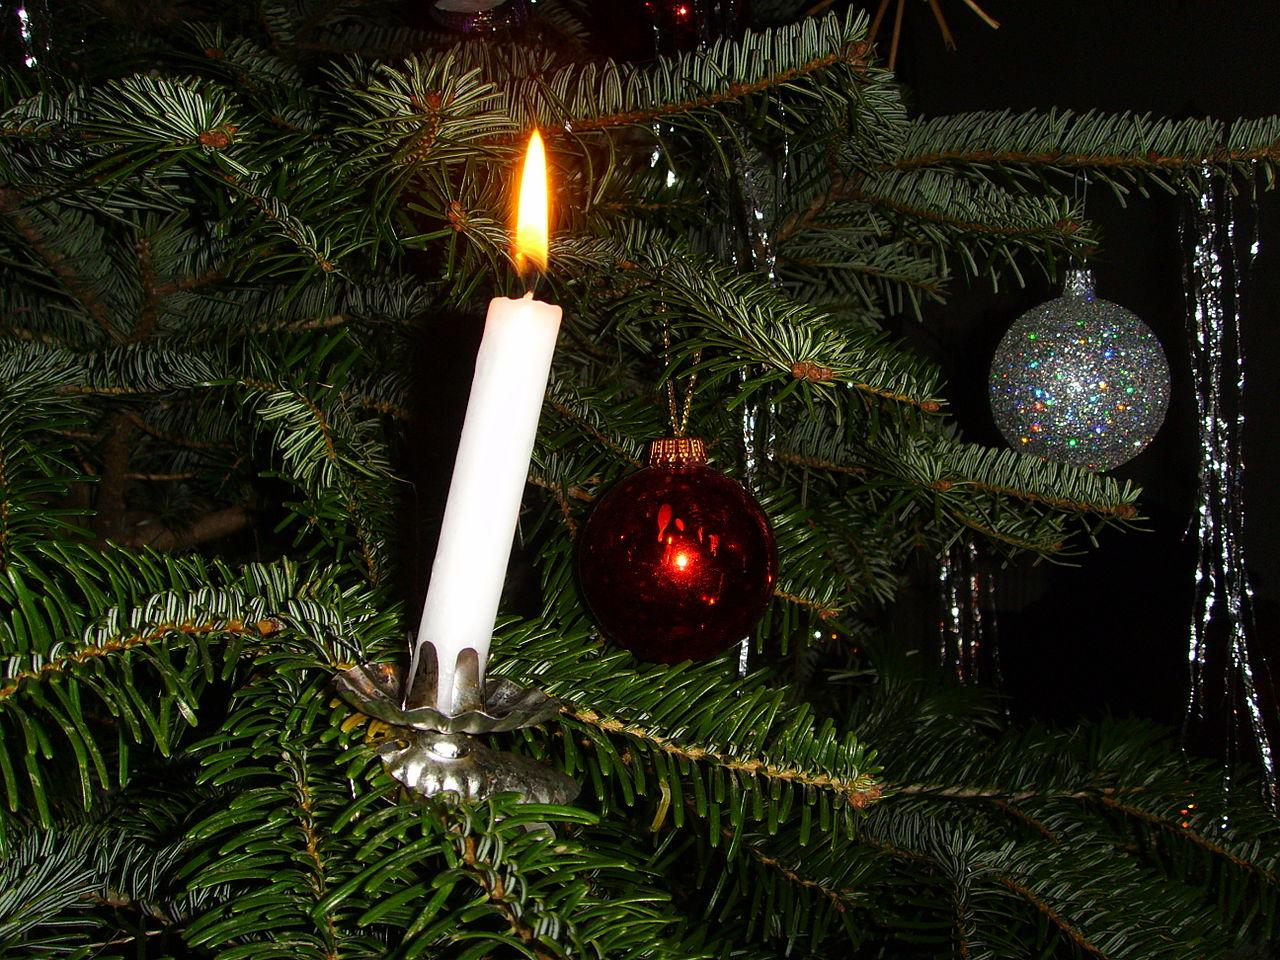 filecandle on christmas treejpg wikimedia commons